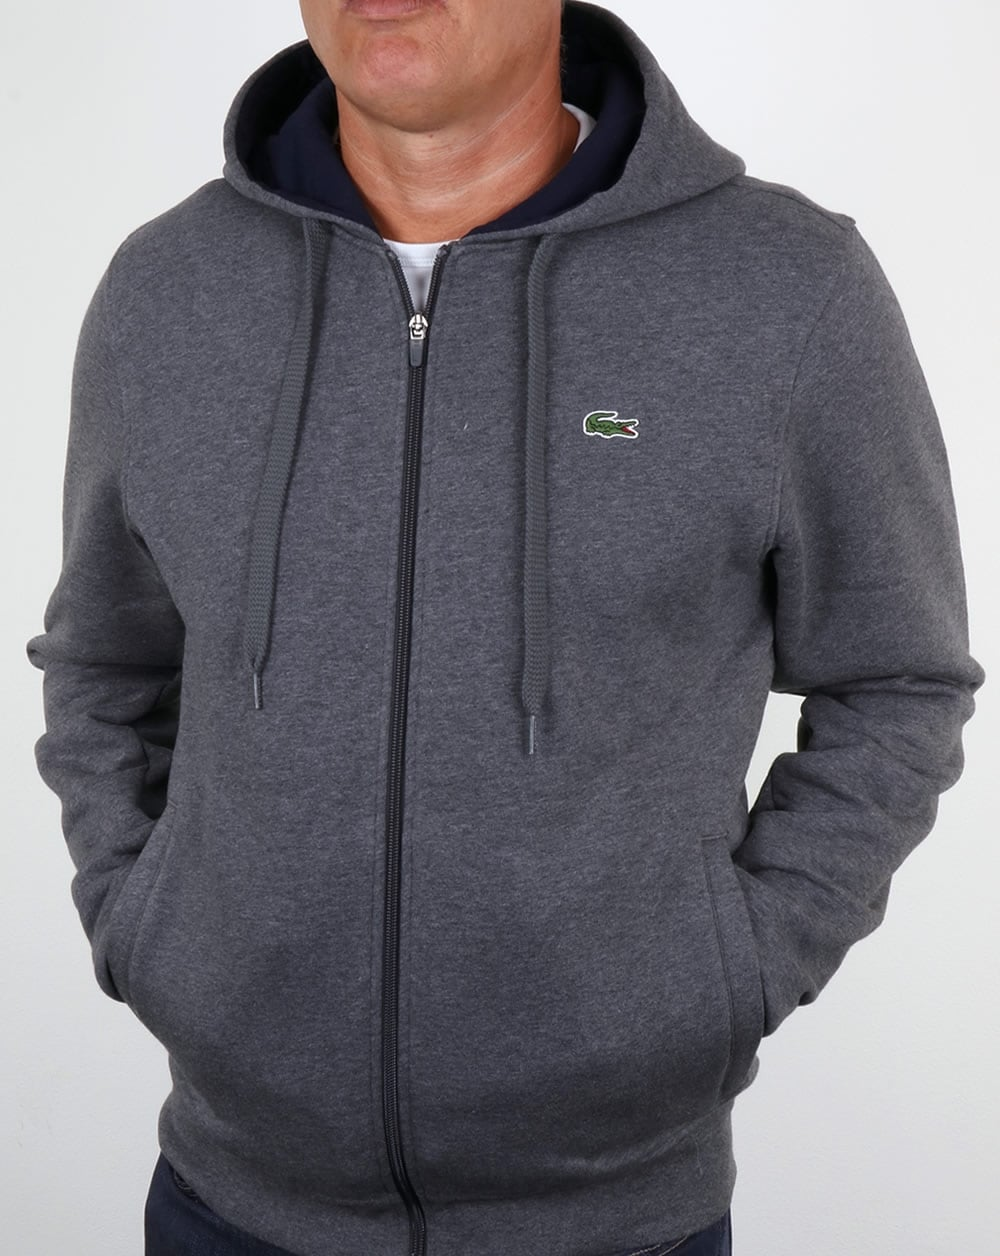 e5af18974fe9 Lacoste Lacoste Hooded Full Zip Sweatshirt Pitch Navy